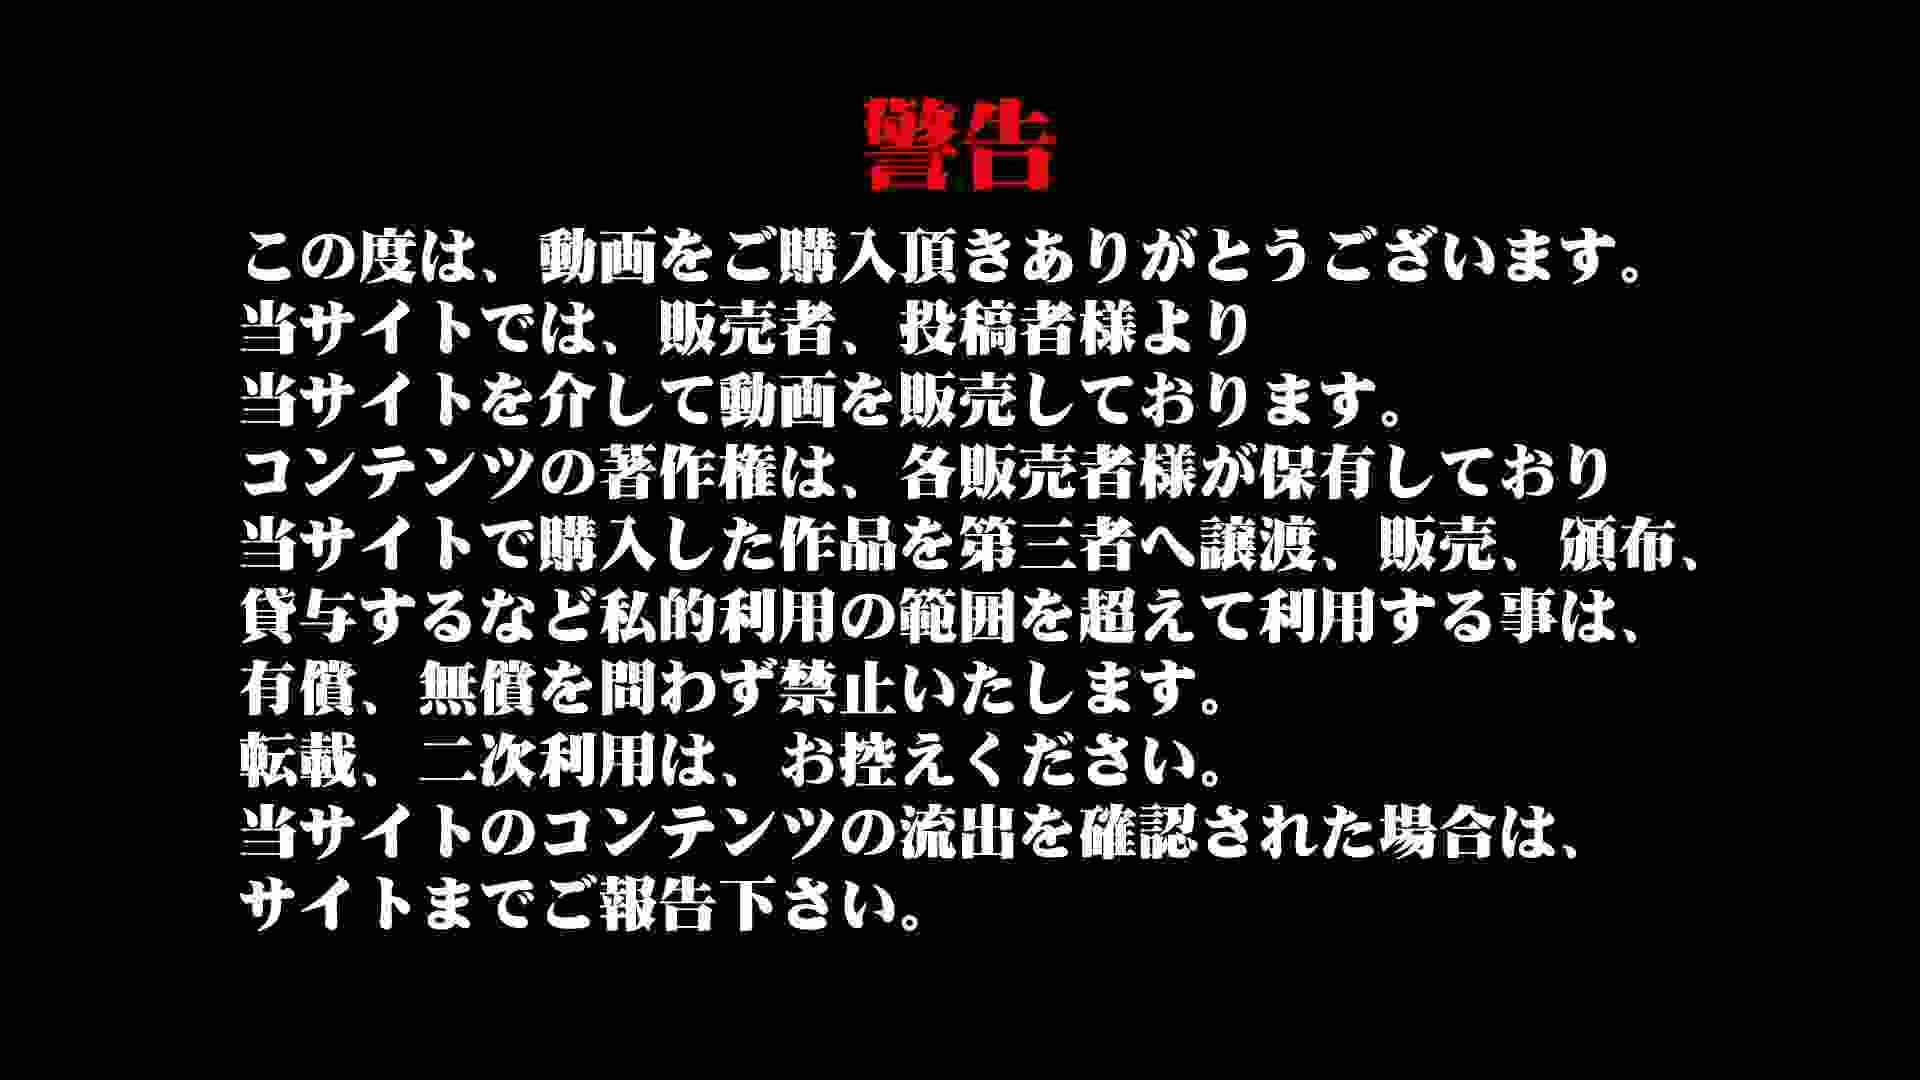 Aquaな露天風呂Vol.887 0 | 0  91連発 1